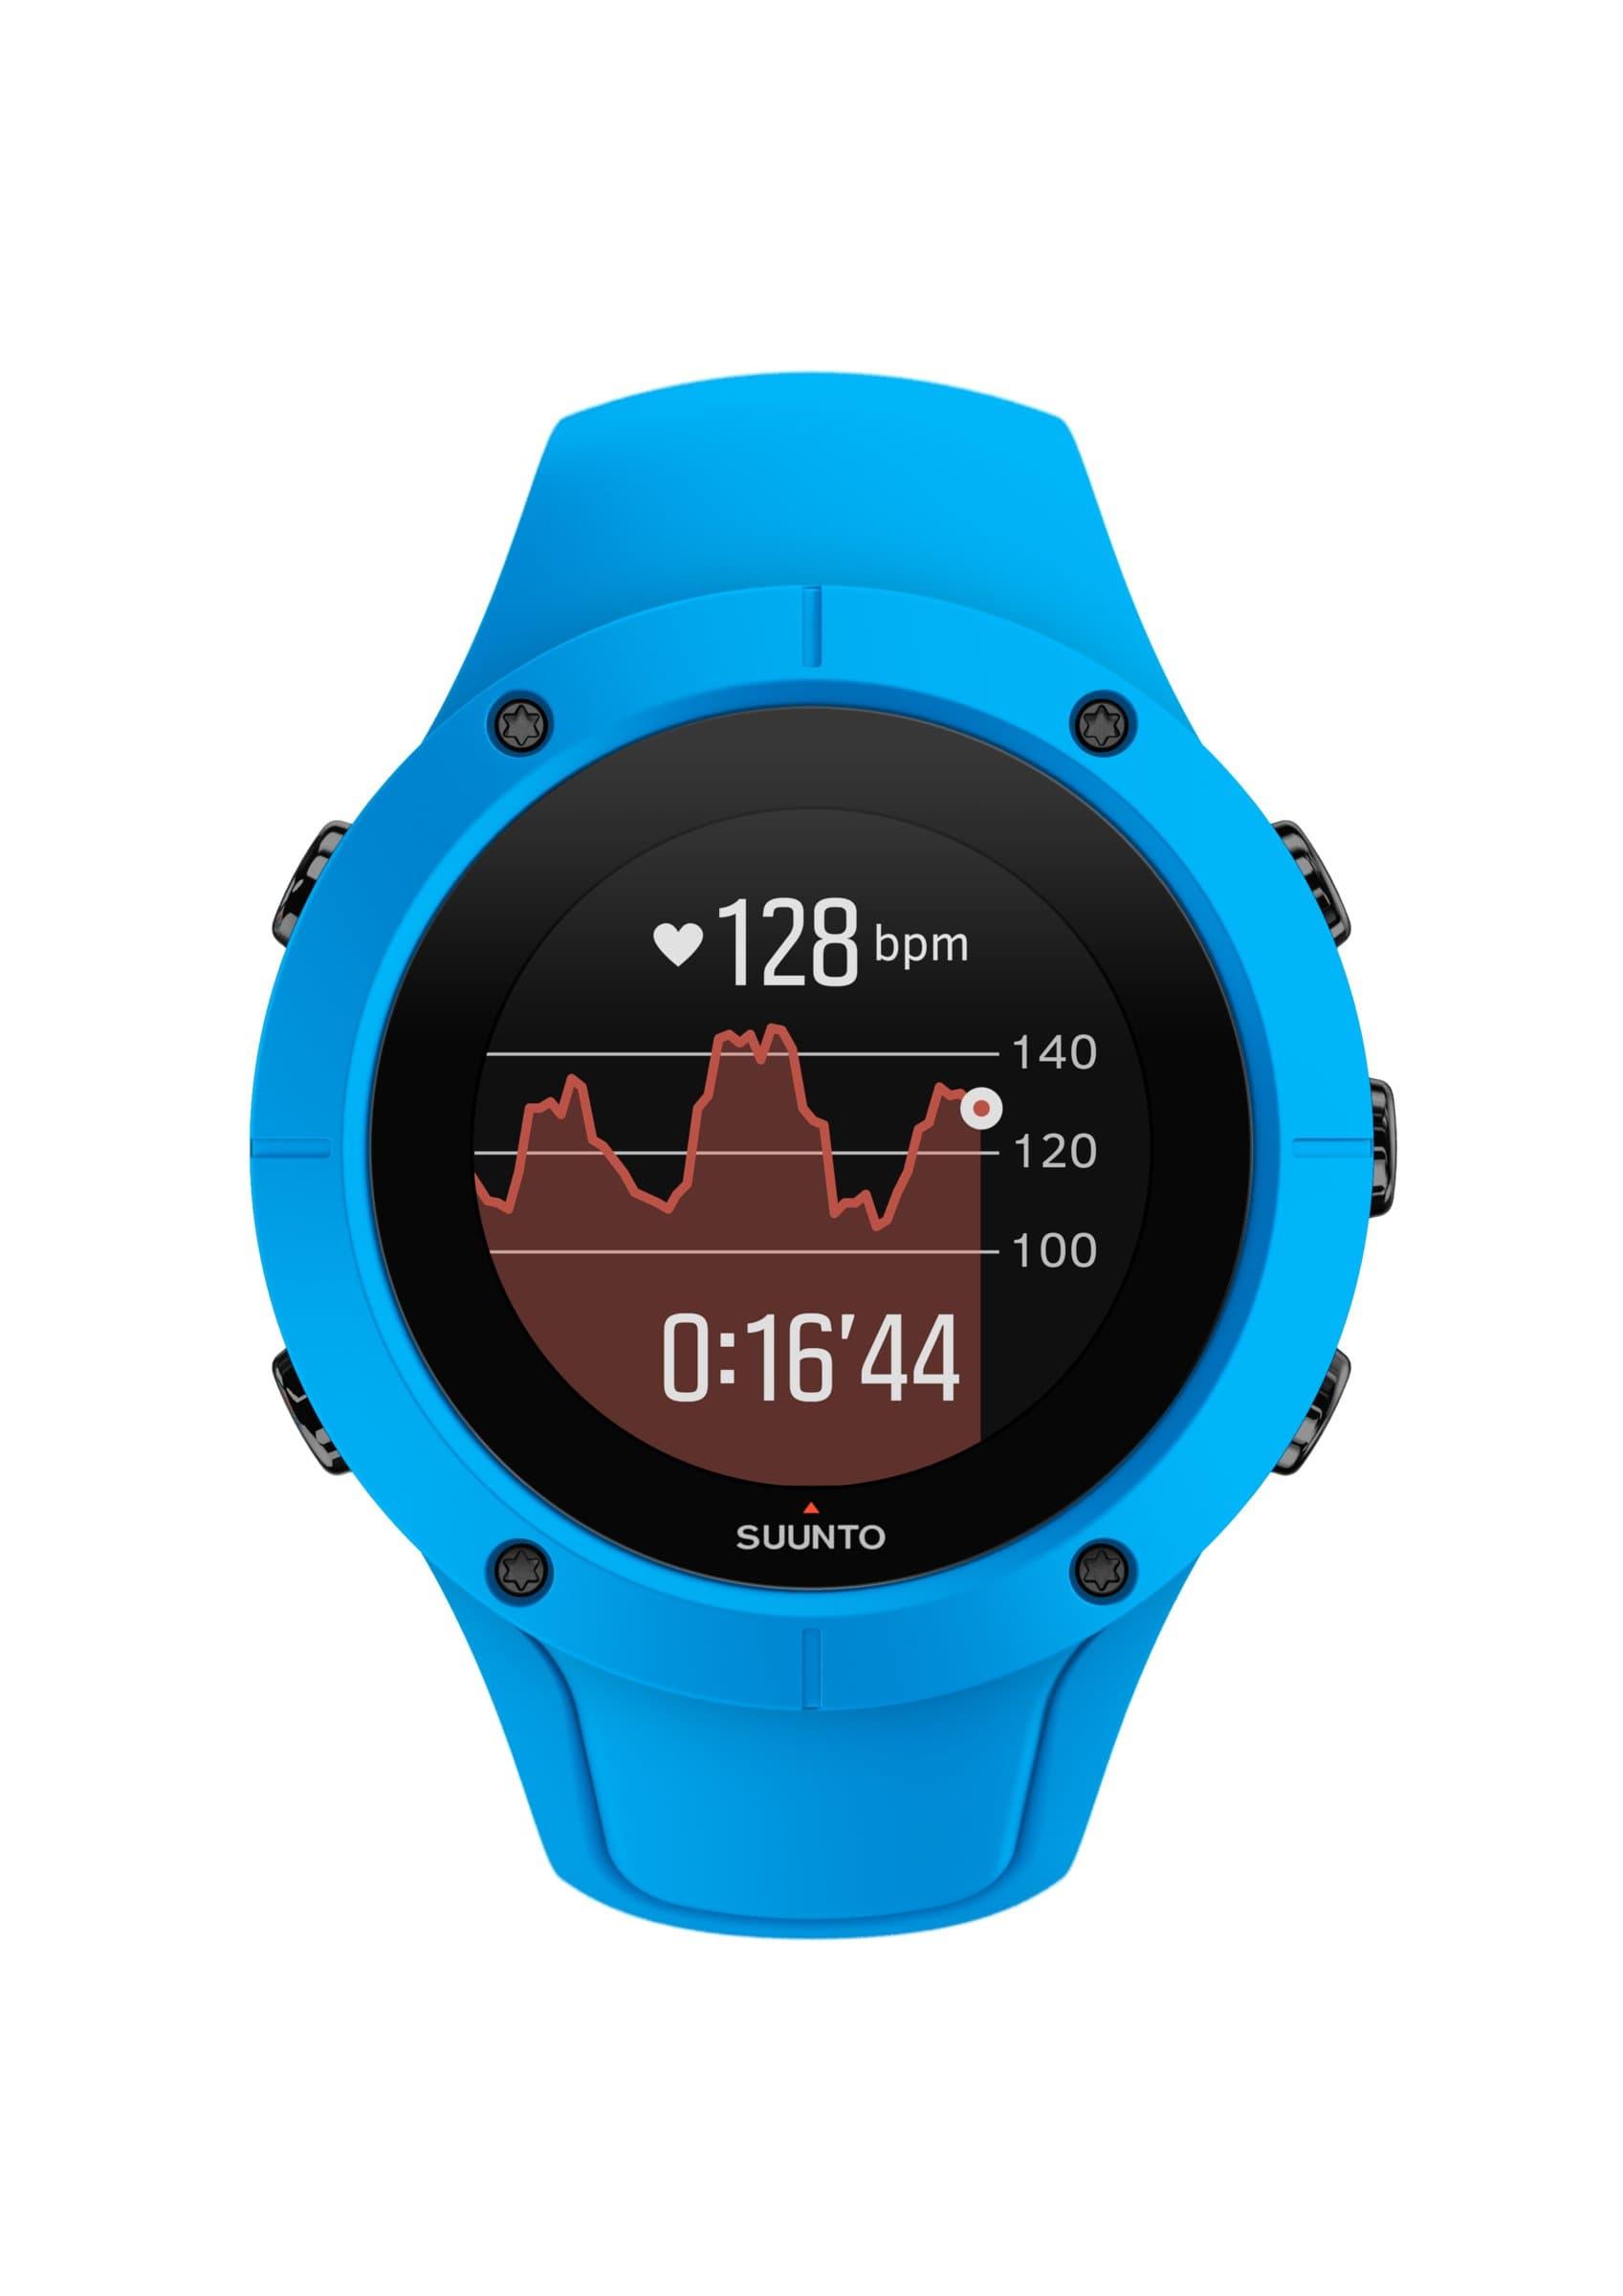 Suunto Spartan Trainer Wrist OHR Cardiofréquencemètre